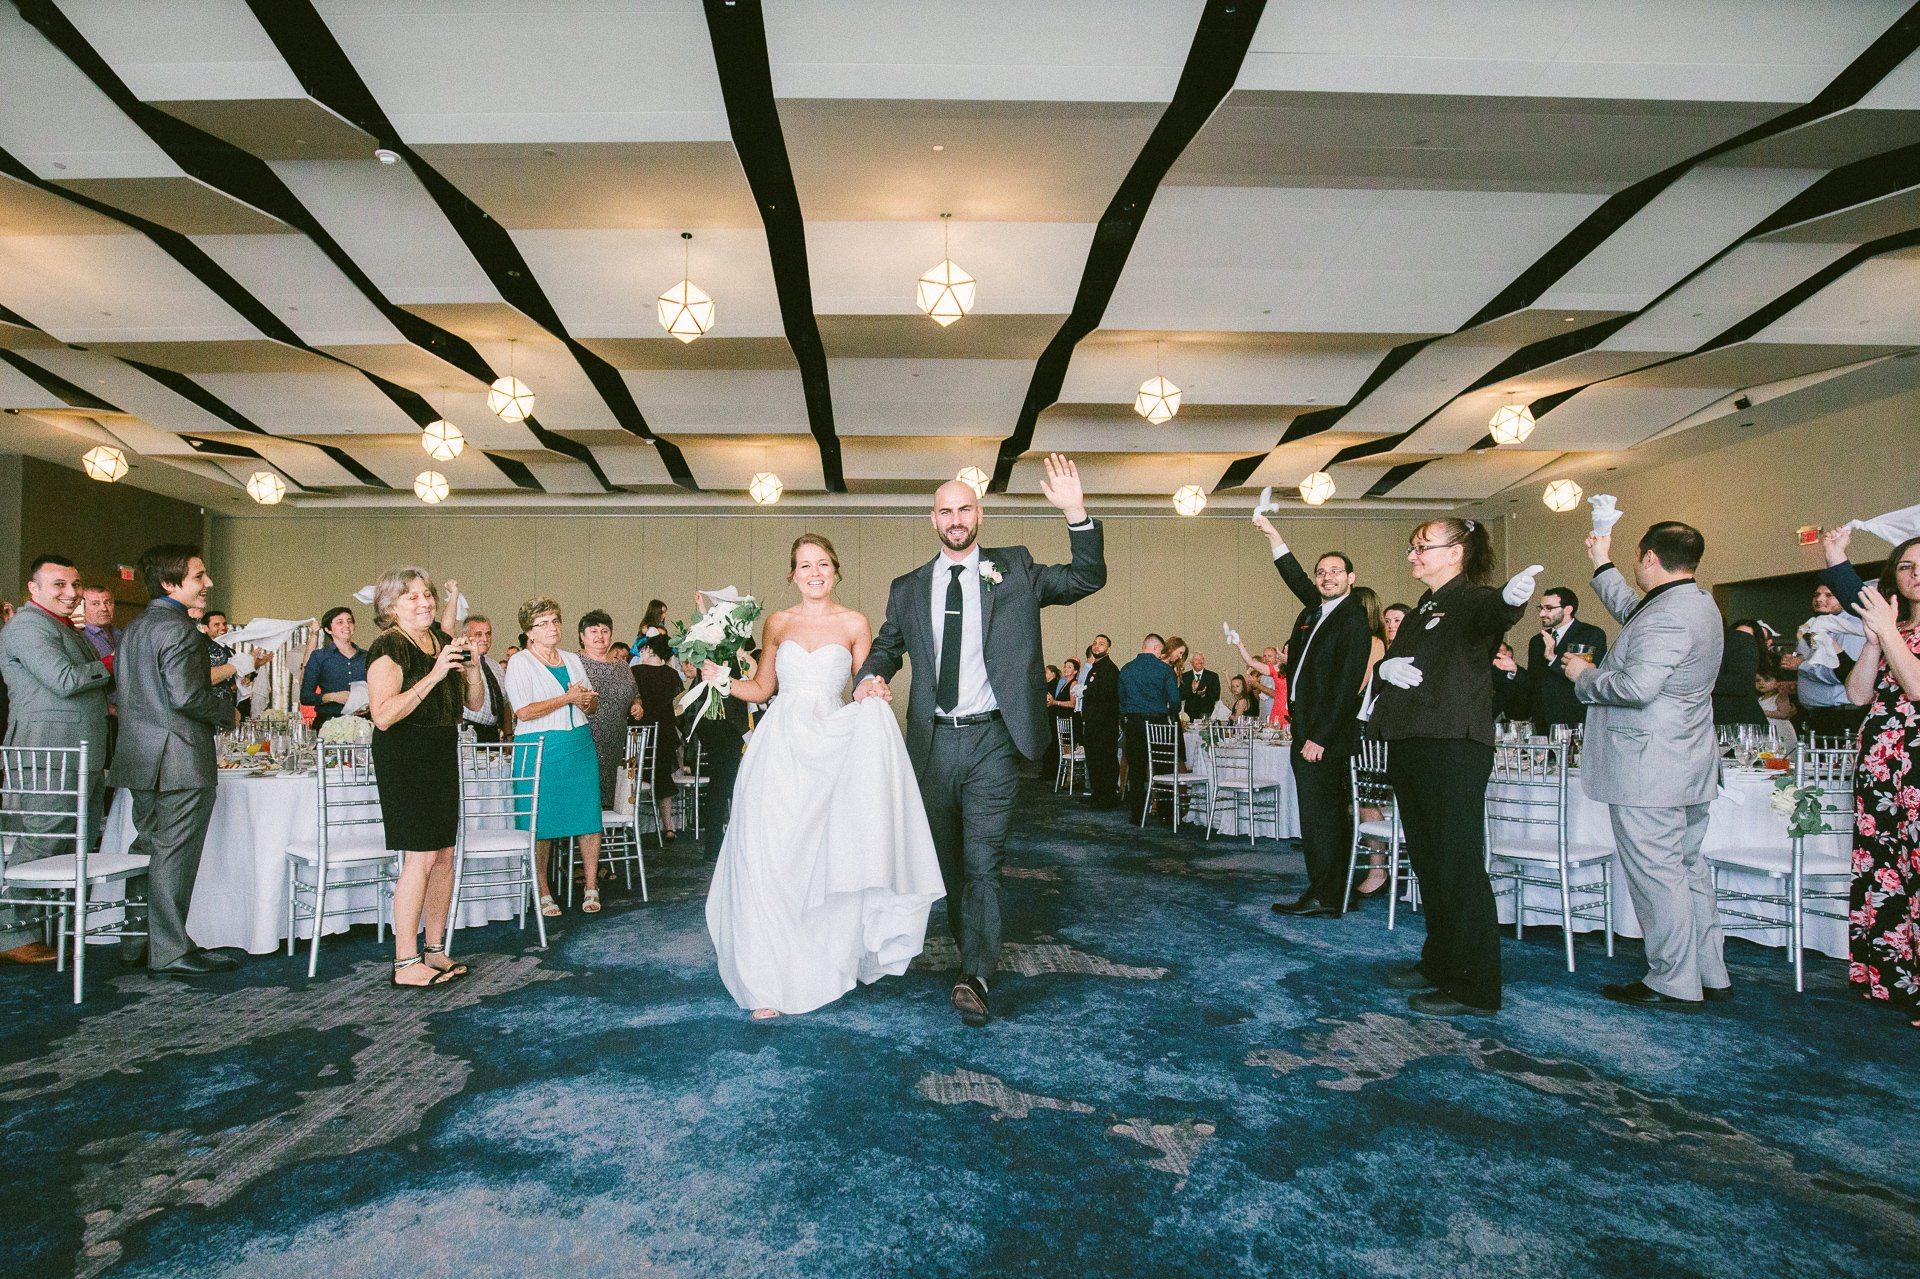 Dowtown Hilton Cleveland Wedding Photographer 2 21.jpg